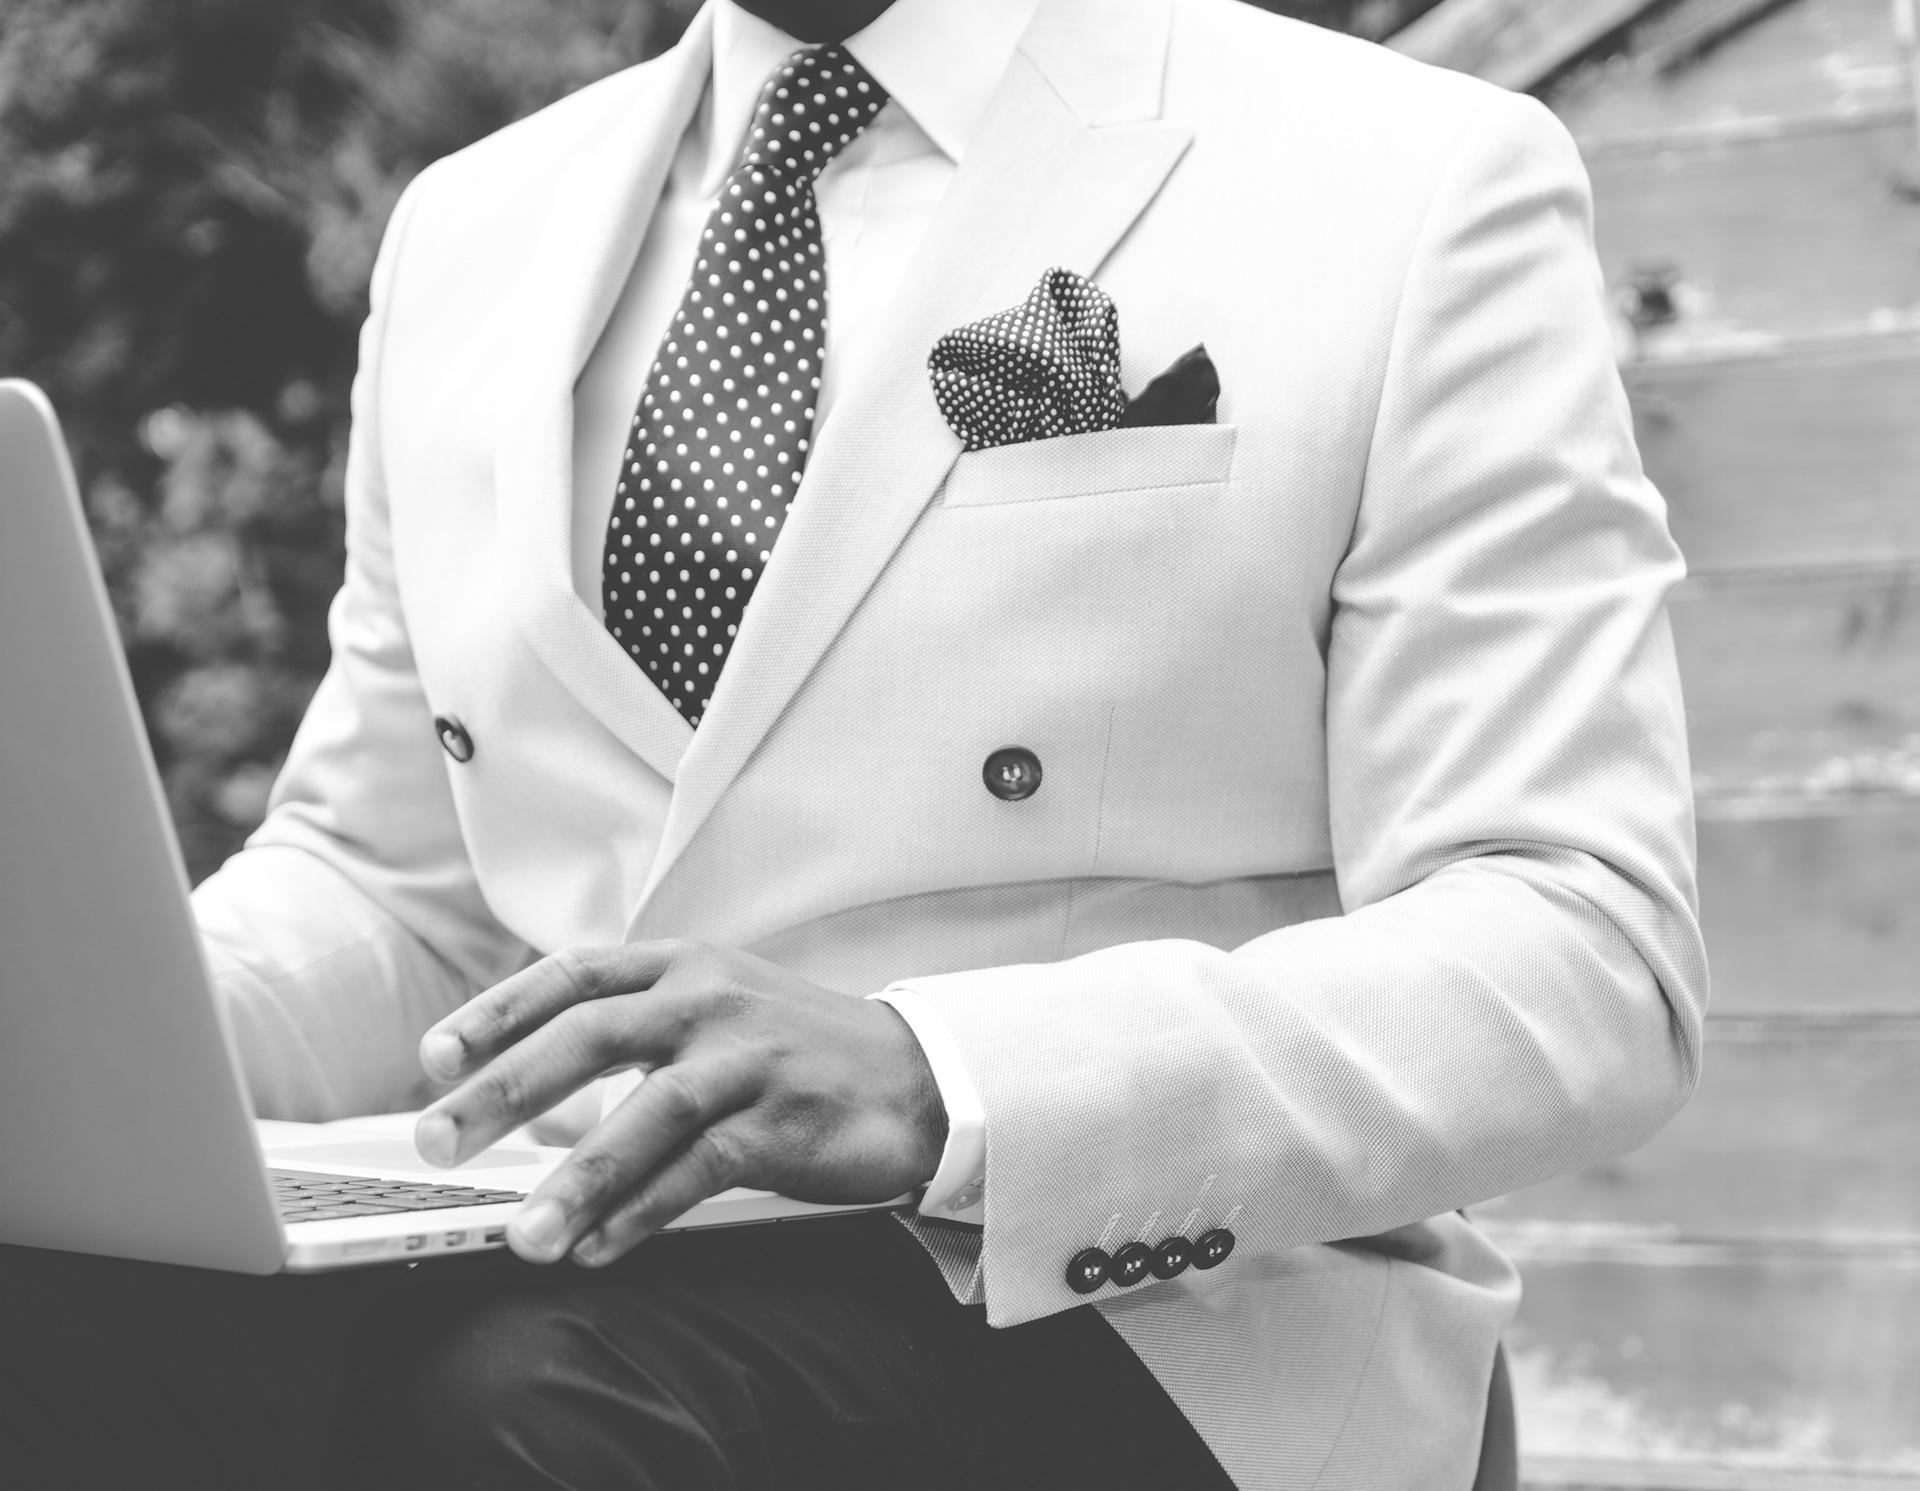 Enterpreneur in suit, working away from home